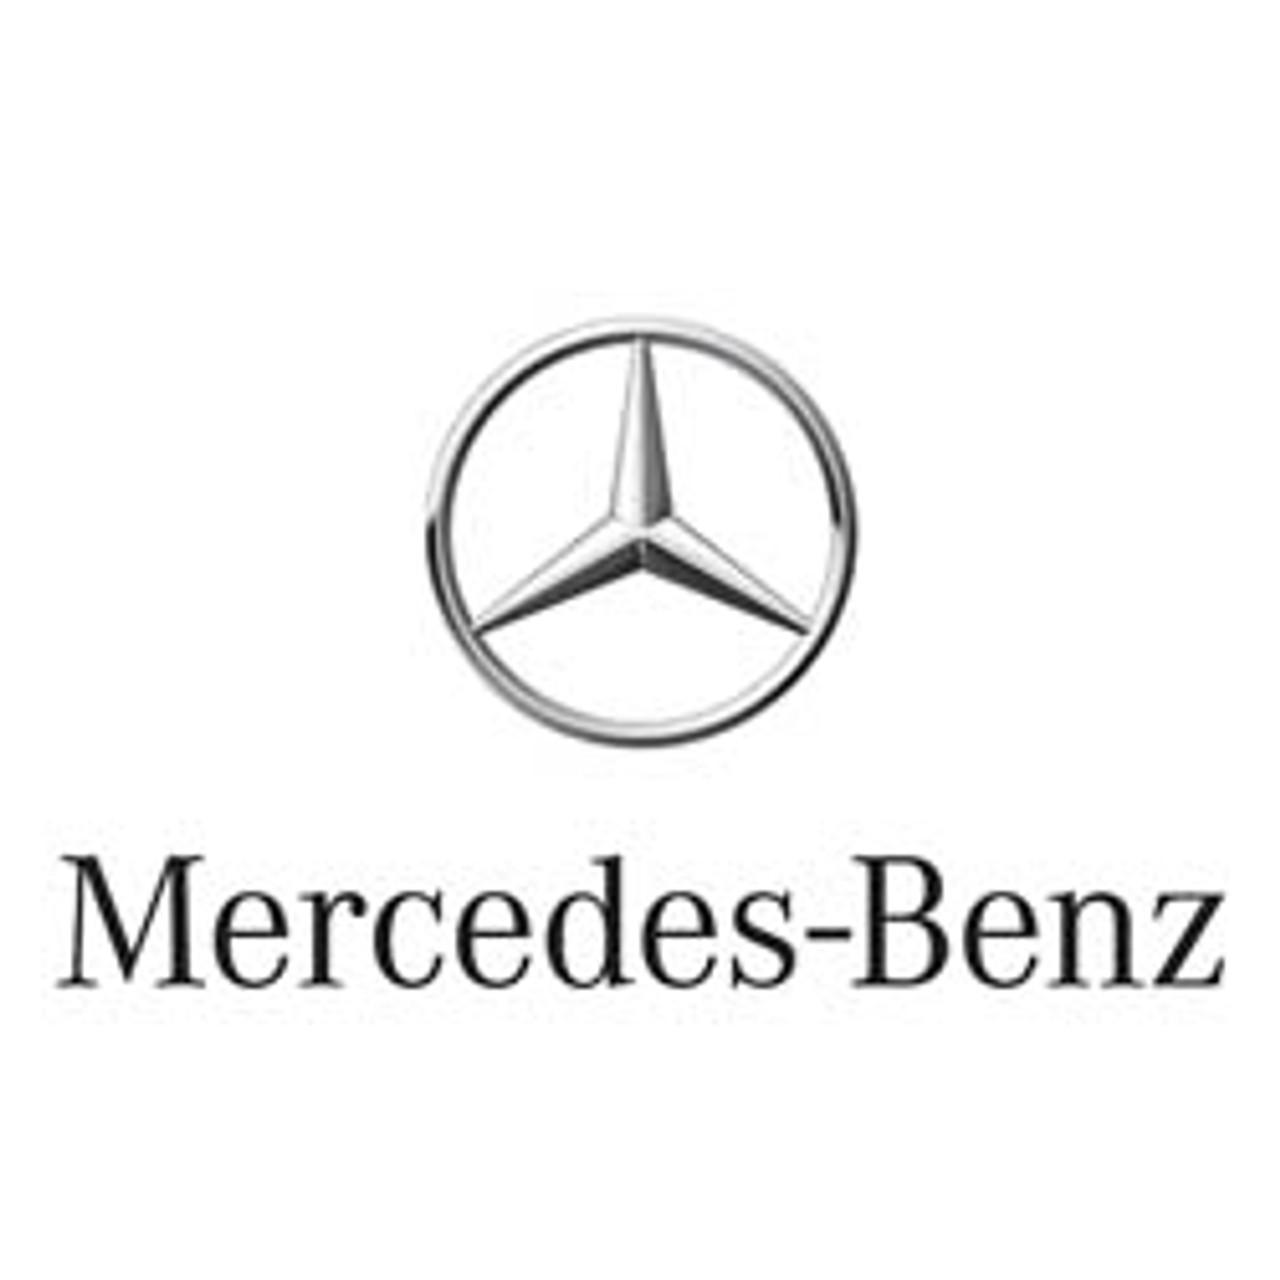 Mercedes- Benz